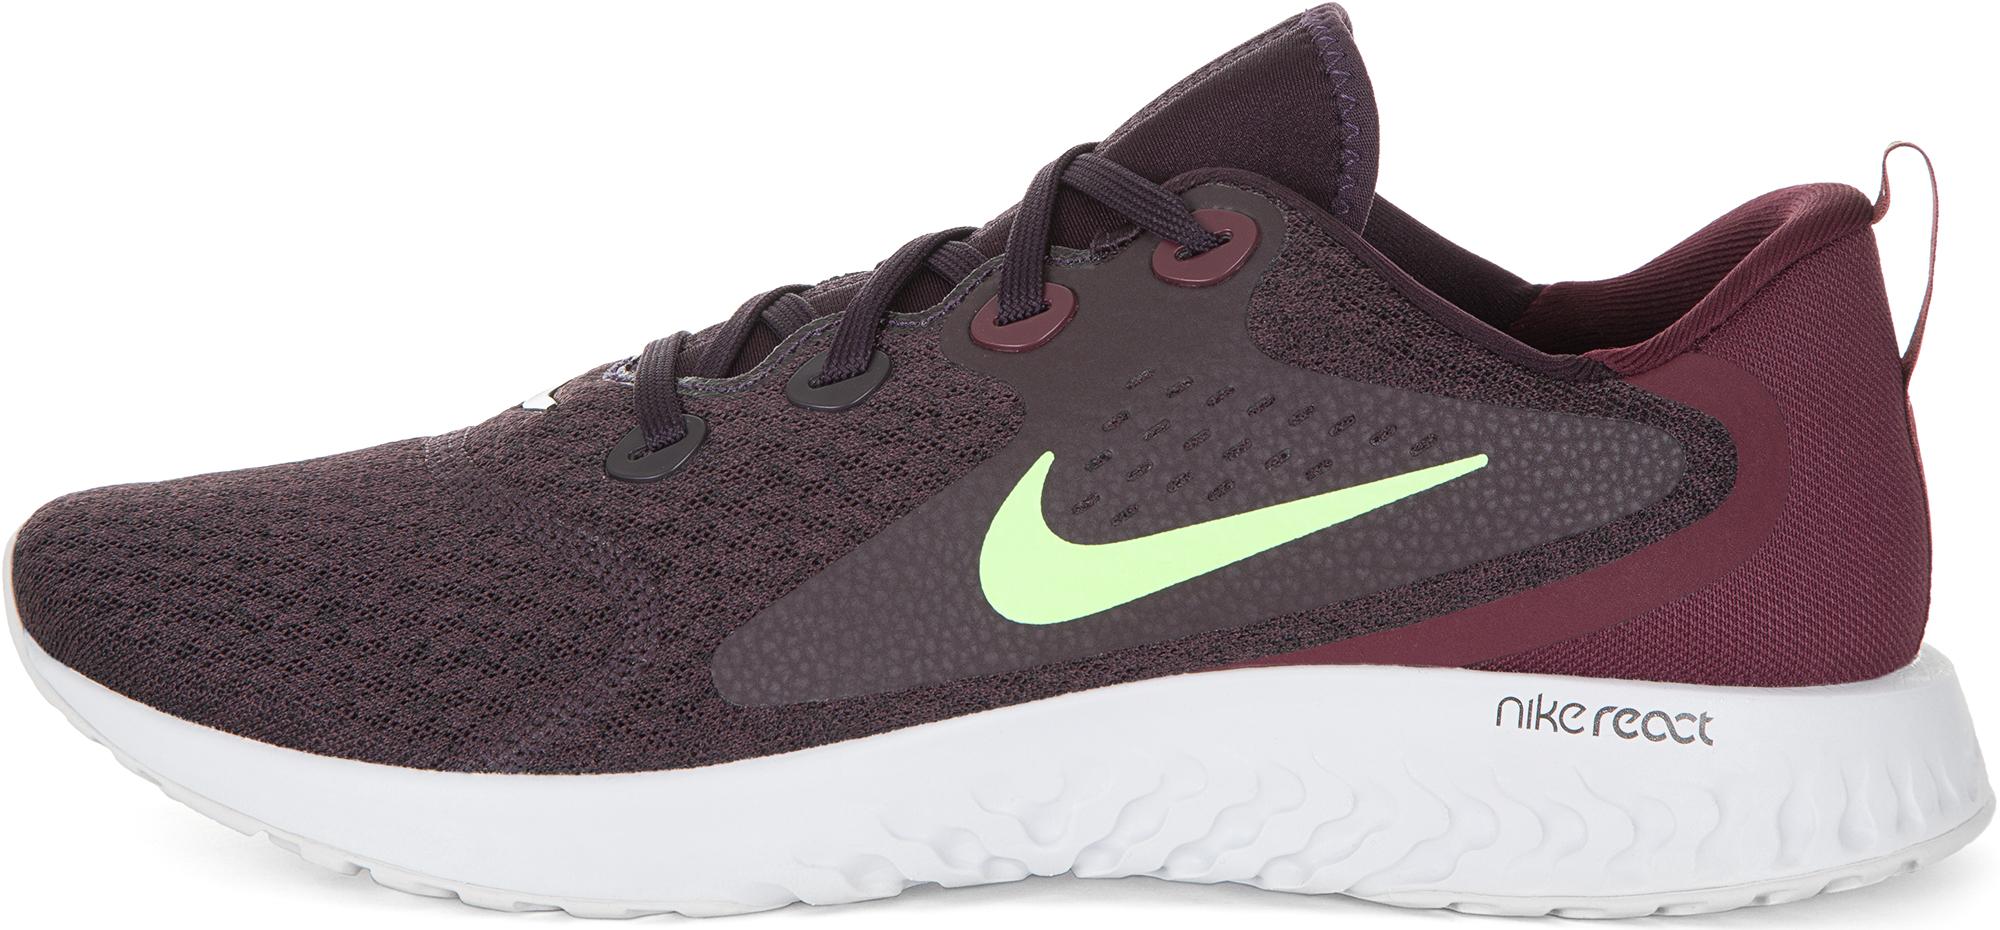 Nike Кроссовки мужские Nike Legend React, размер 44 nike боксерки мужские nike machomai размер 44